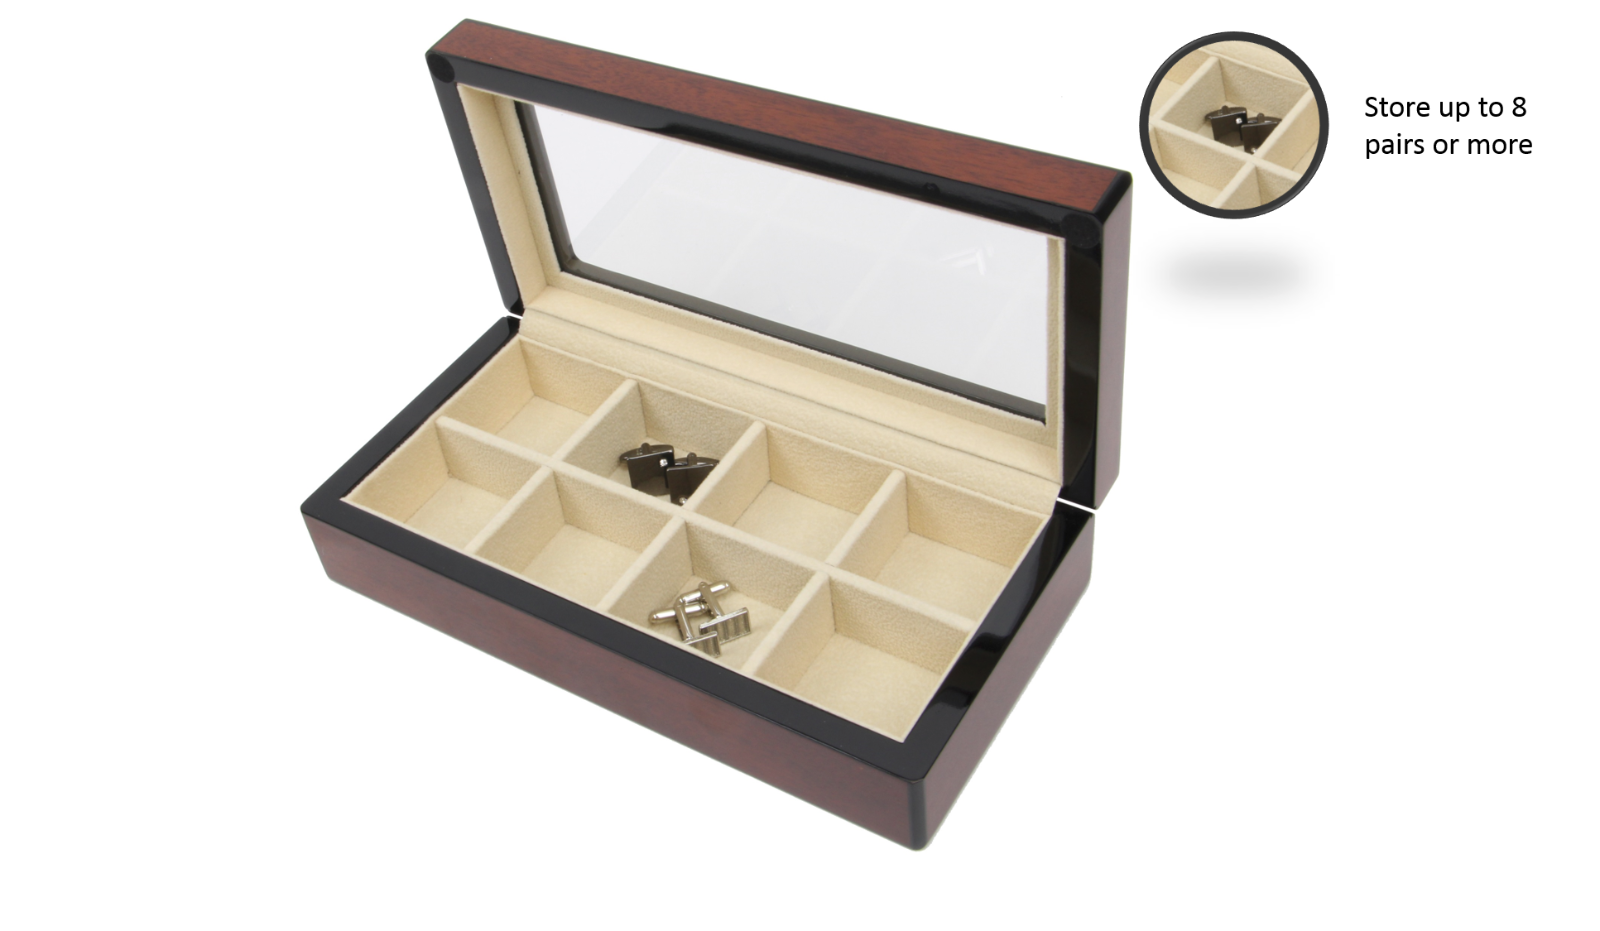 DECOREBAYWOOD CUFFLINK & RING STORAGE  CASE CUFF LINKS MENS JEWELRY BOX AUSTIN